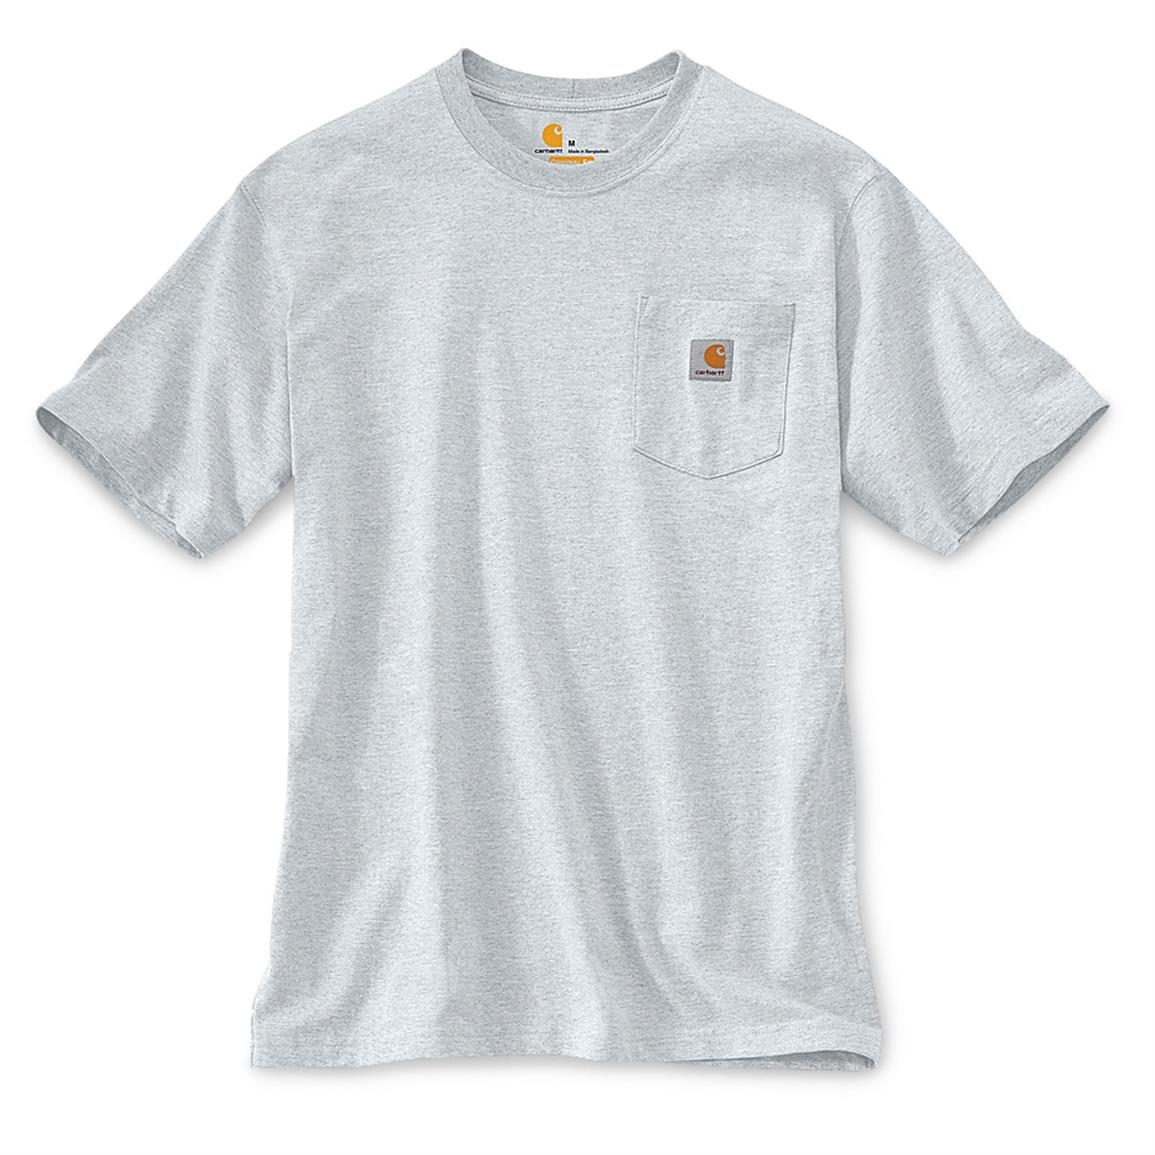 7571970cfc1 Carhartt Mens Long Sleeve Workwear Pocket T Shirt